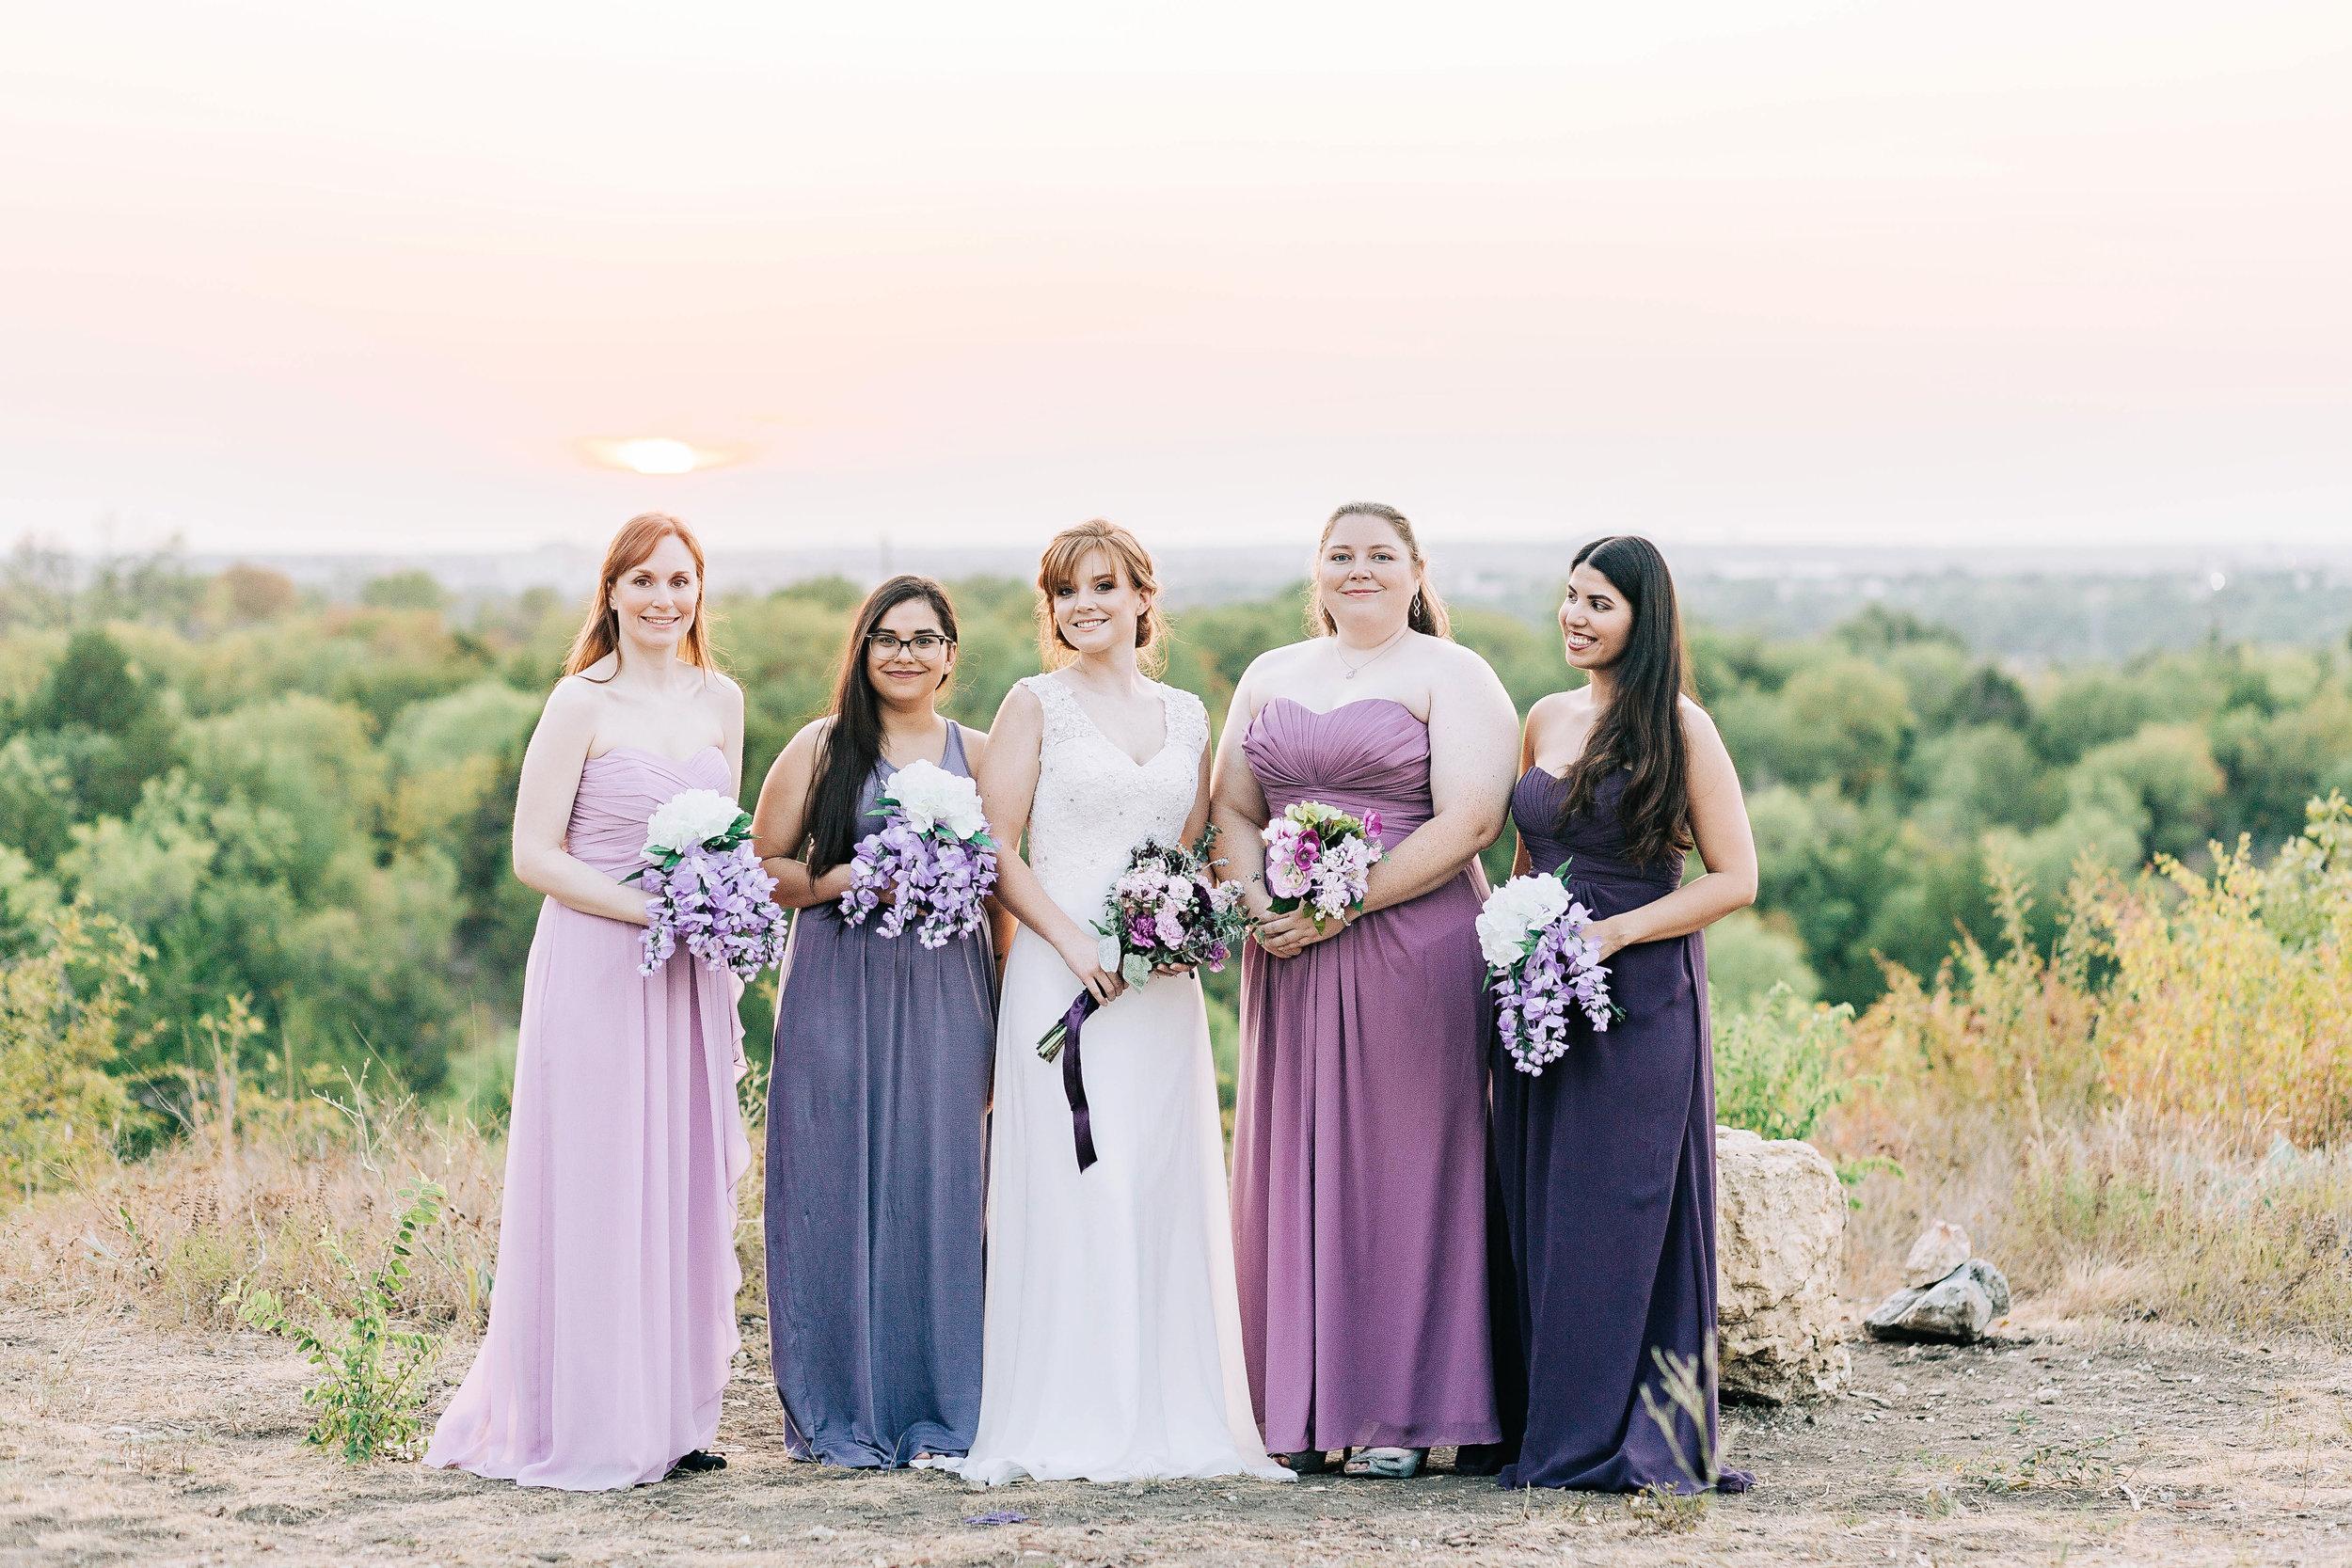 Dallas Fort Worth bridal party